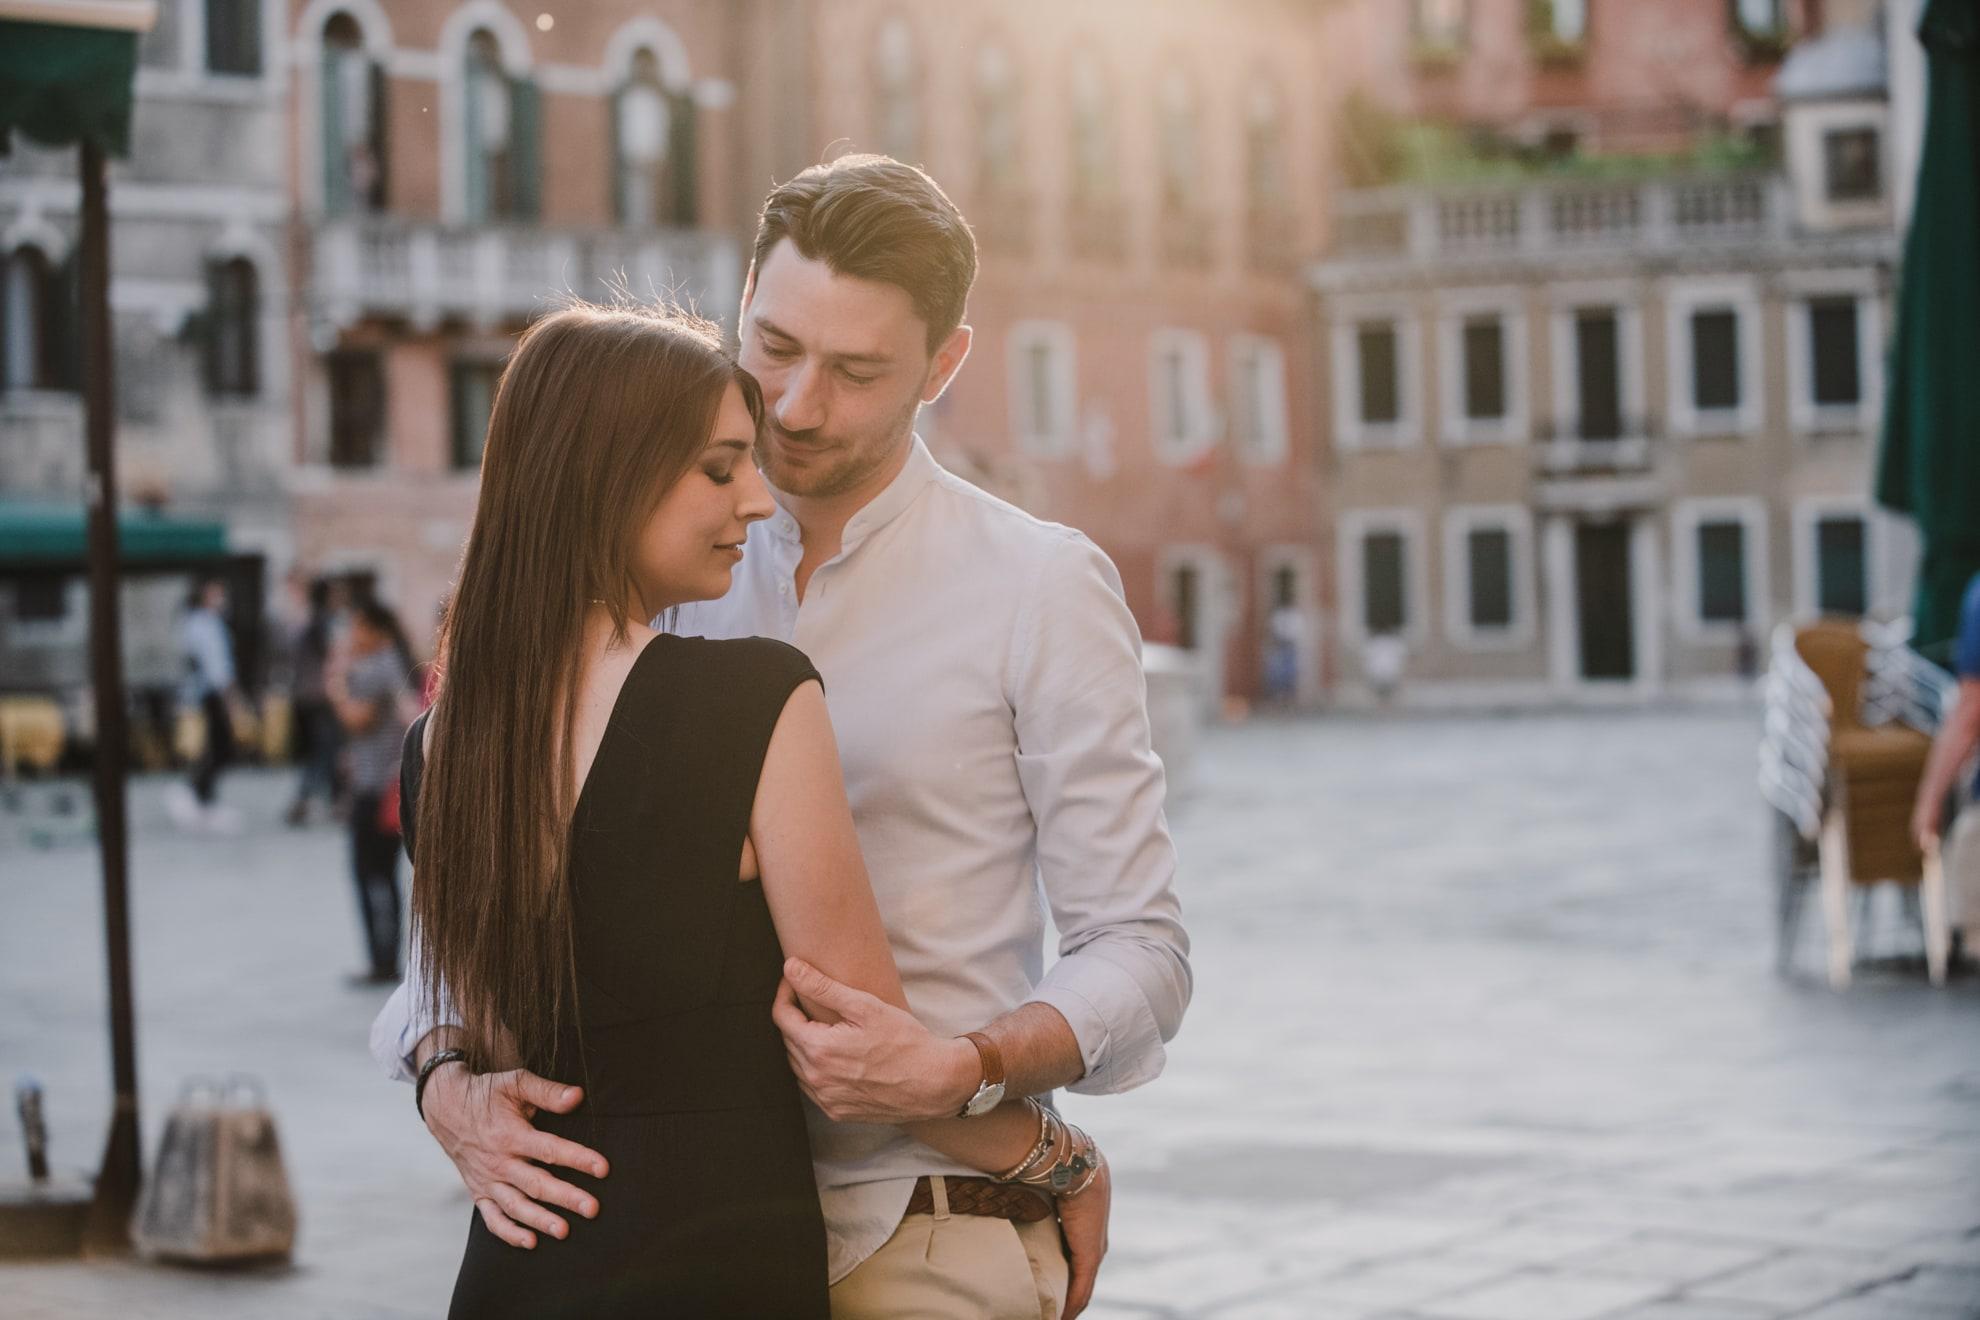 engagement venice venezia proposal proposta matrimonio fidanzamento irene pollacchi fotografa 7